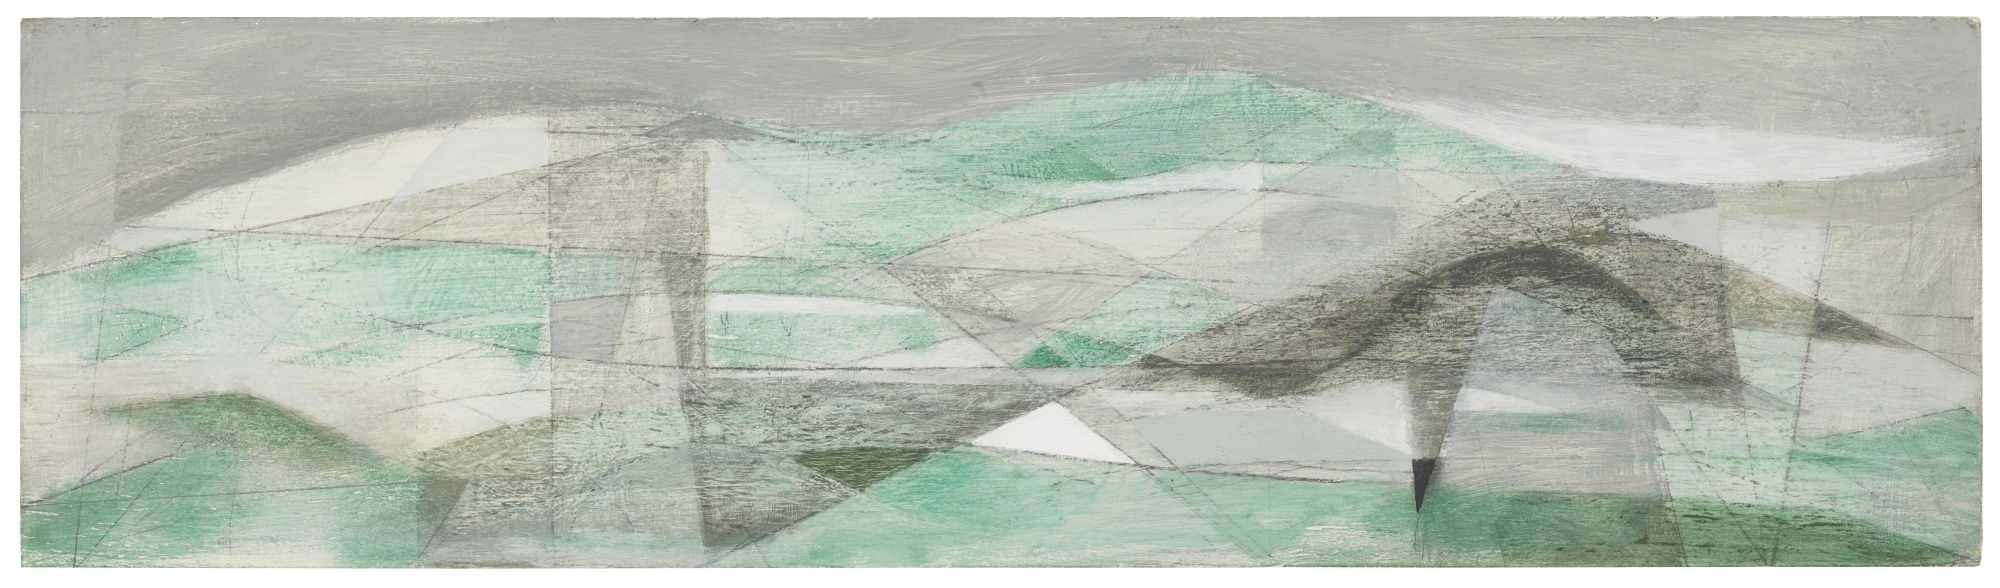 John Wells-Constructed Landscape-1957